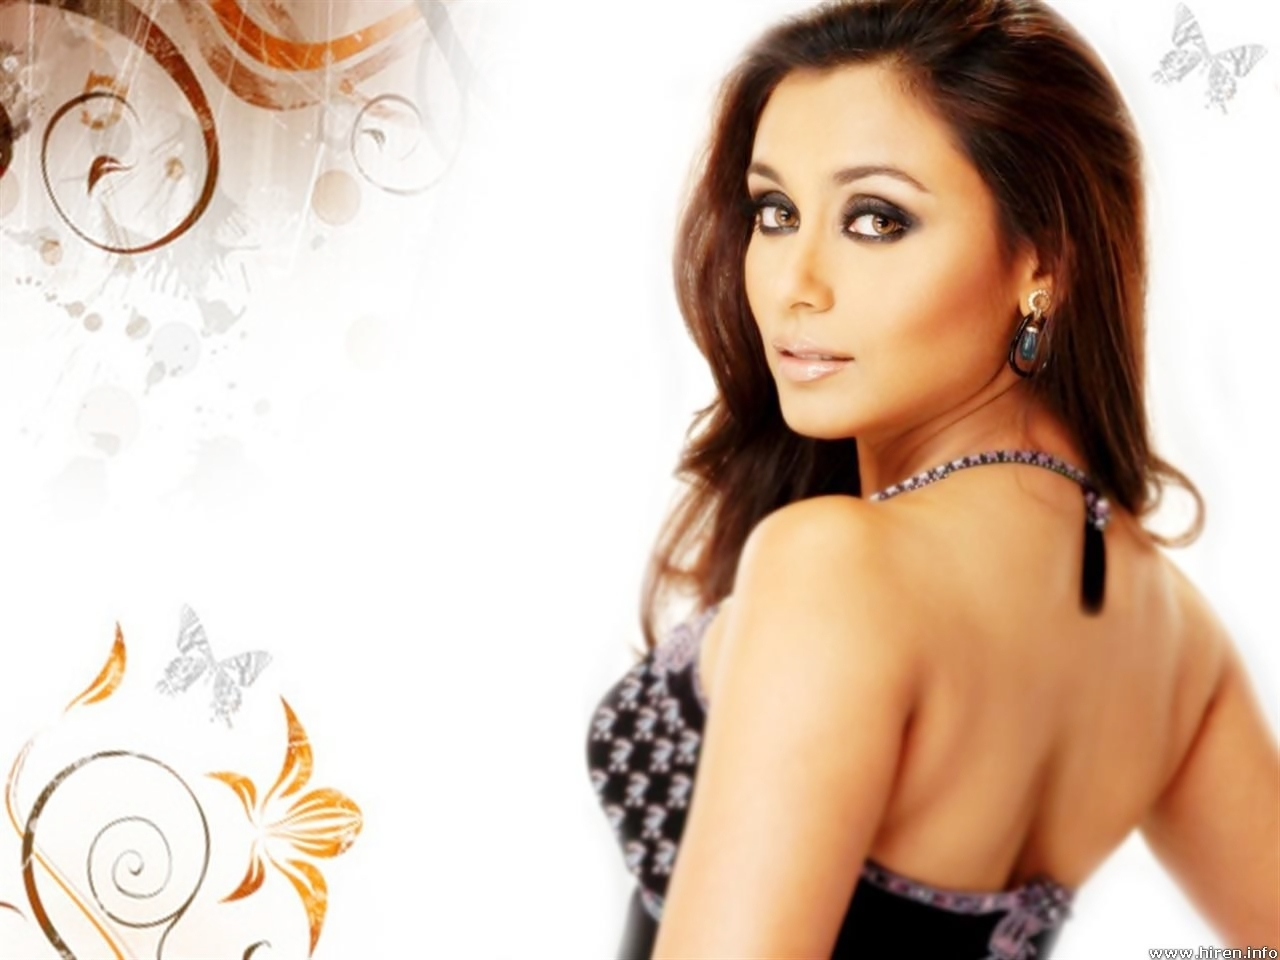 World Actress Bollywood Actress Wallpapers 1280x960